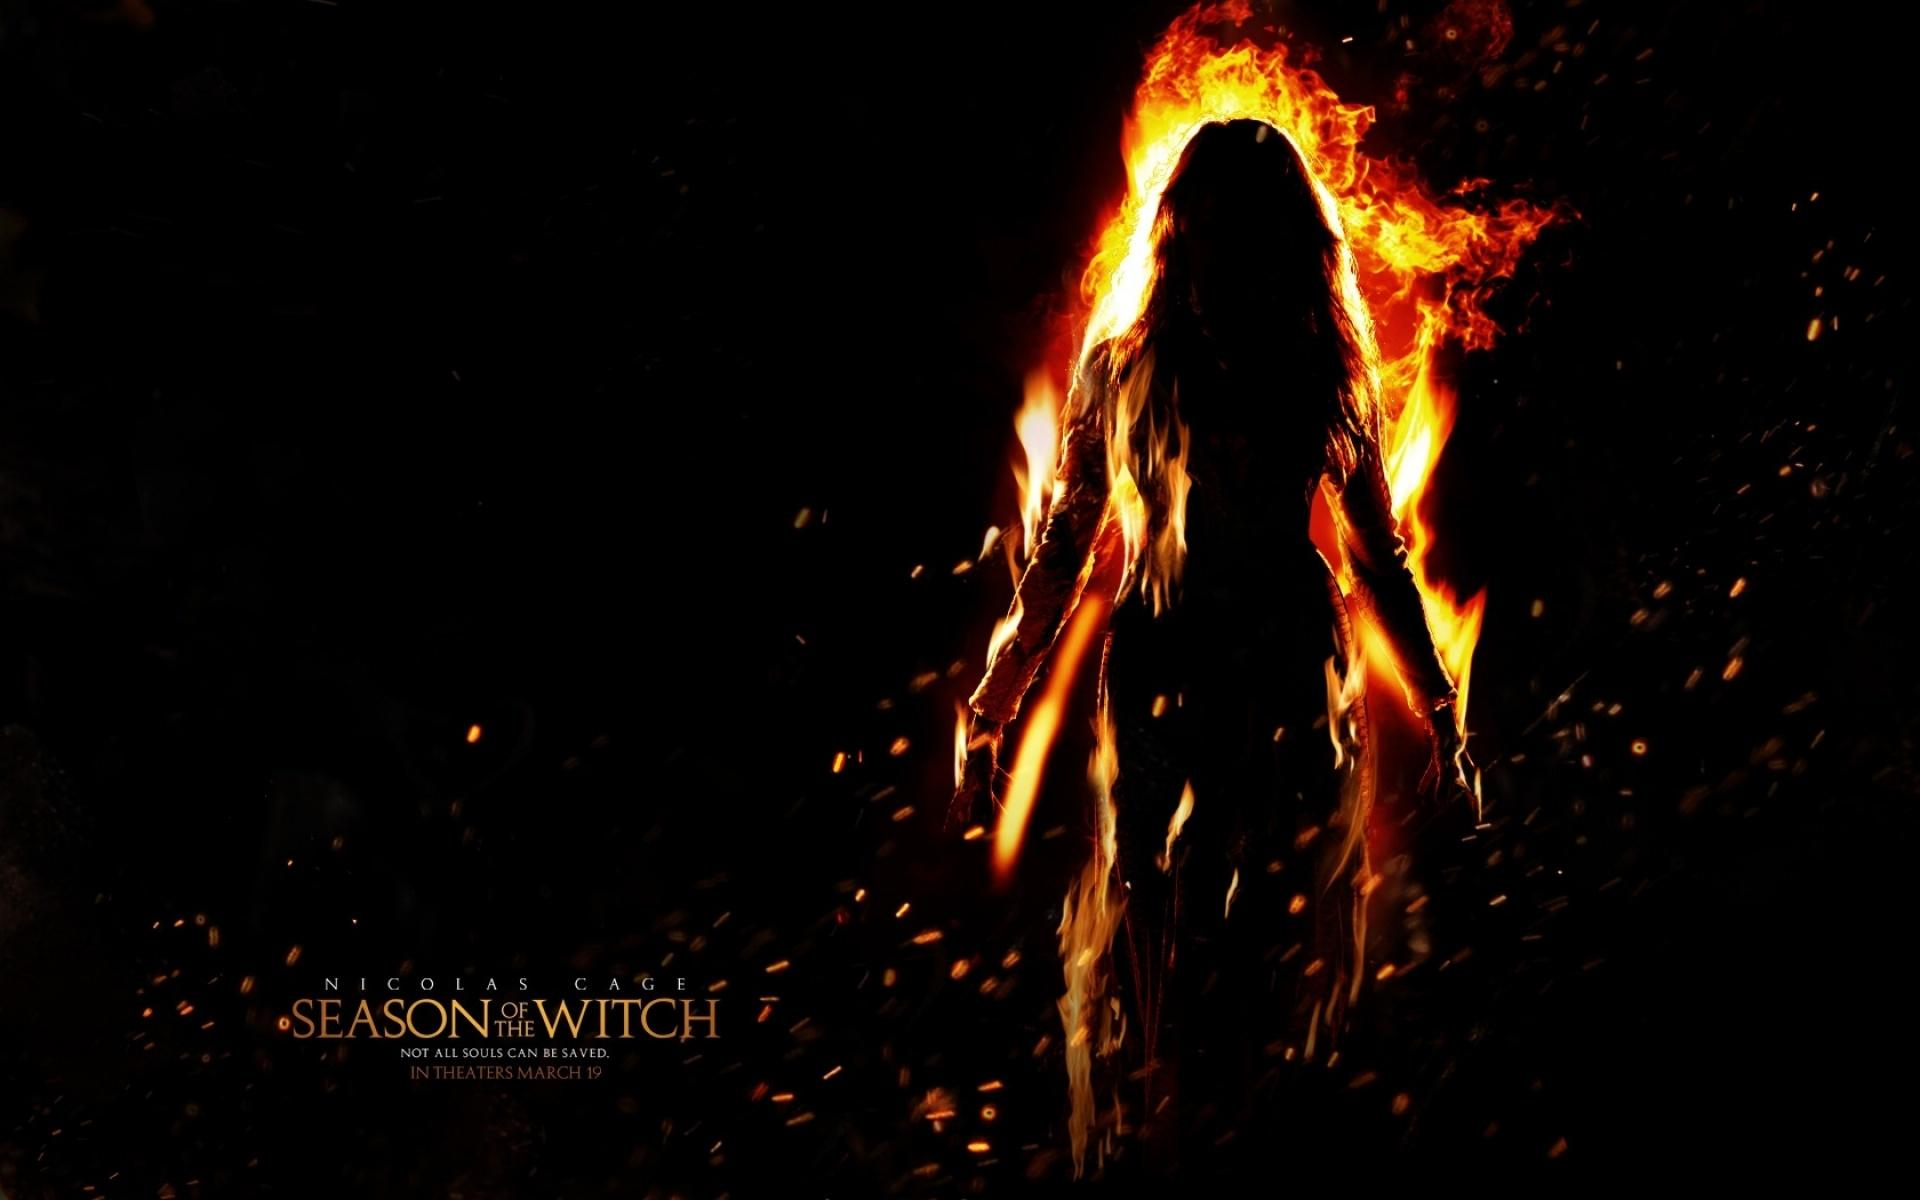 Season Of The Witch Movie Wallpaper Fondo De Pantalla Hd